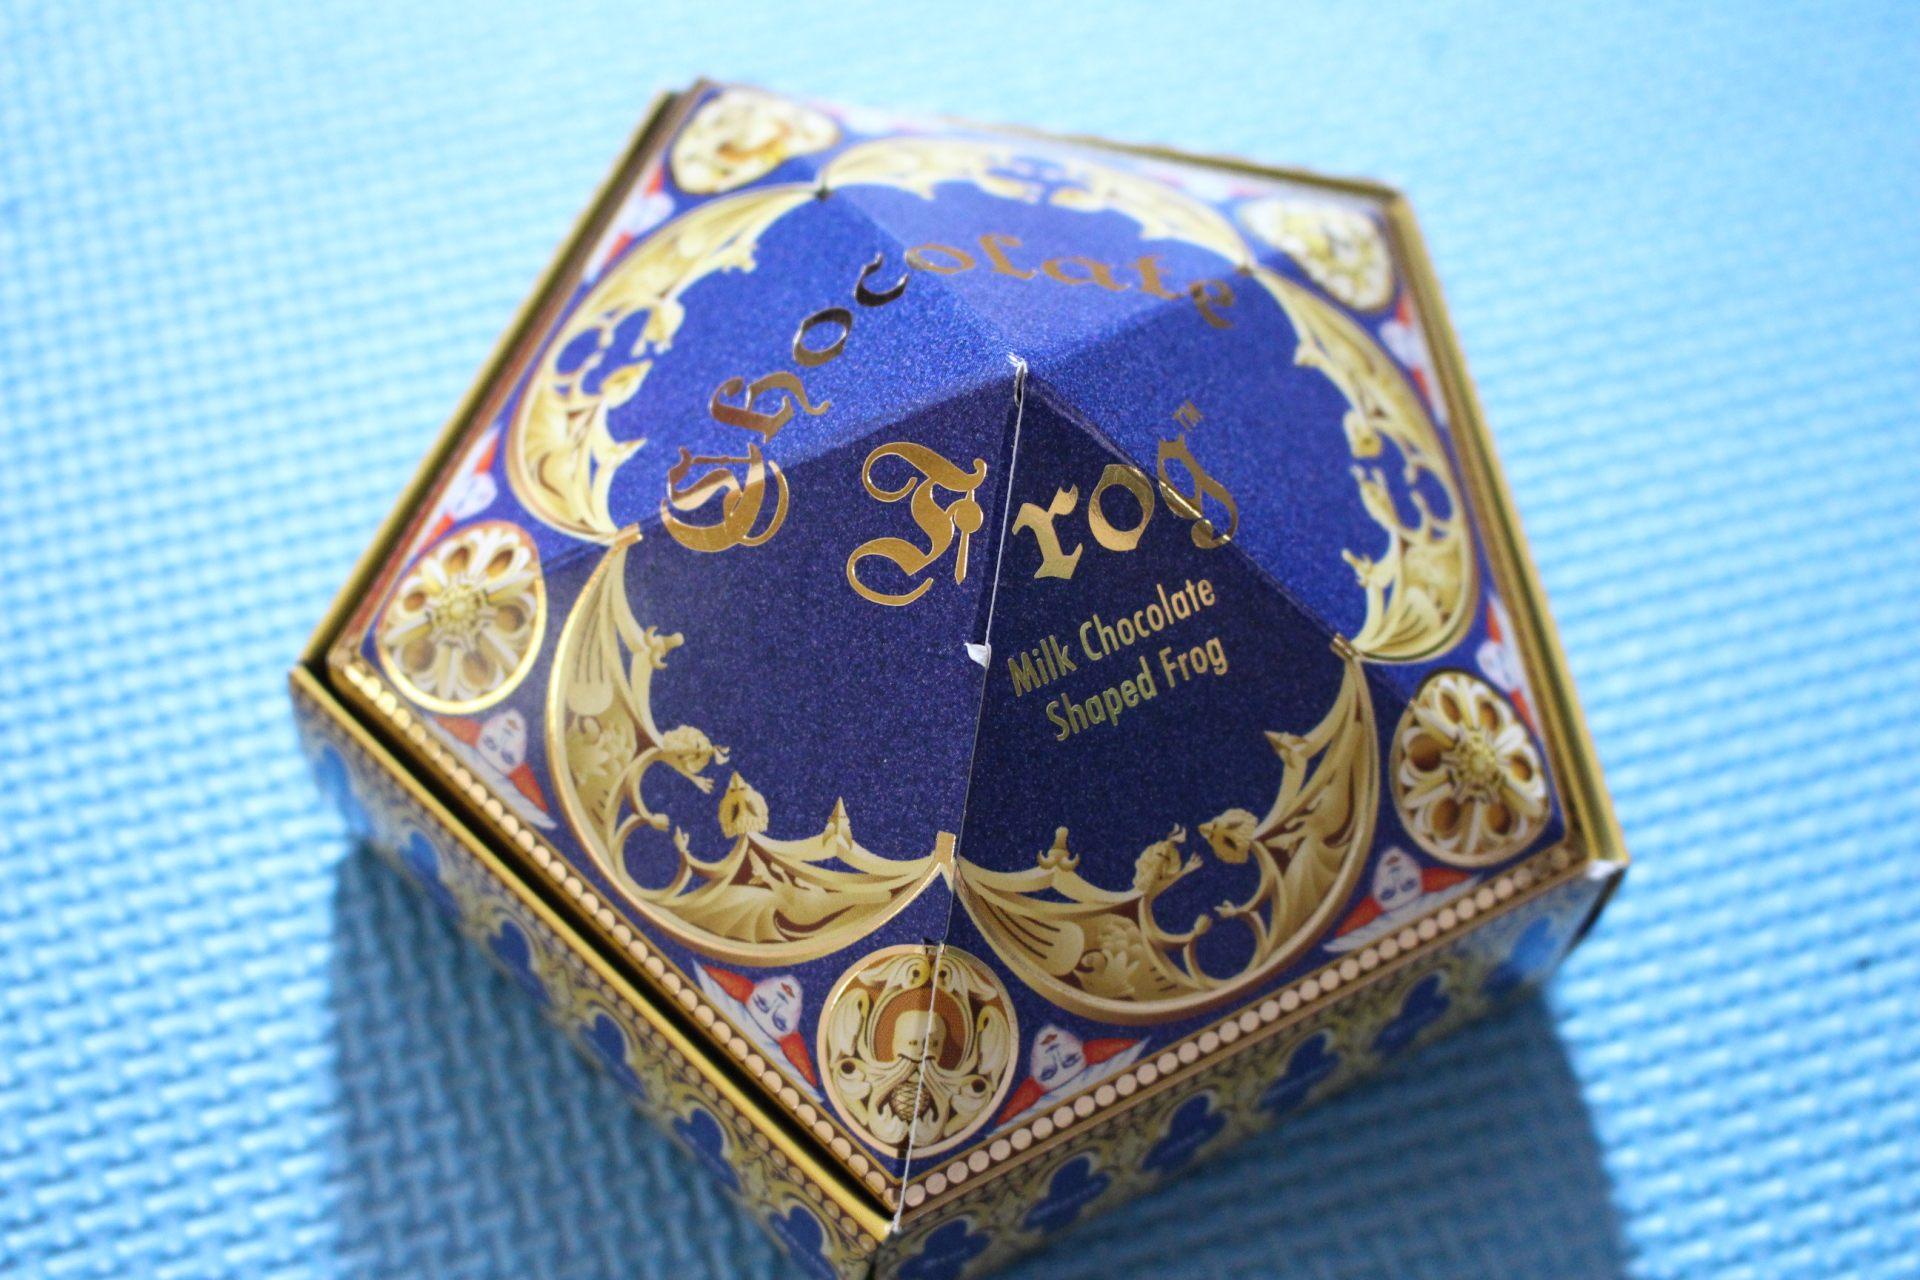 Frog chocolate ¥1200